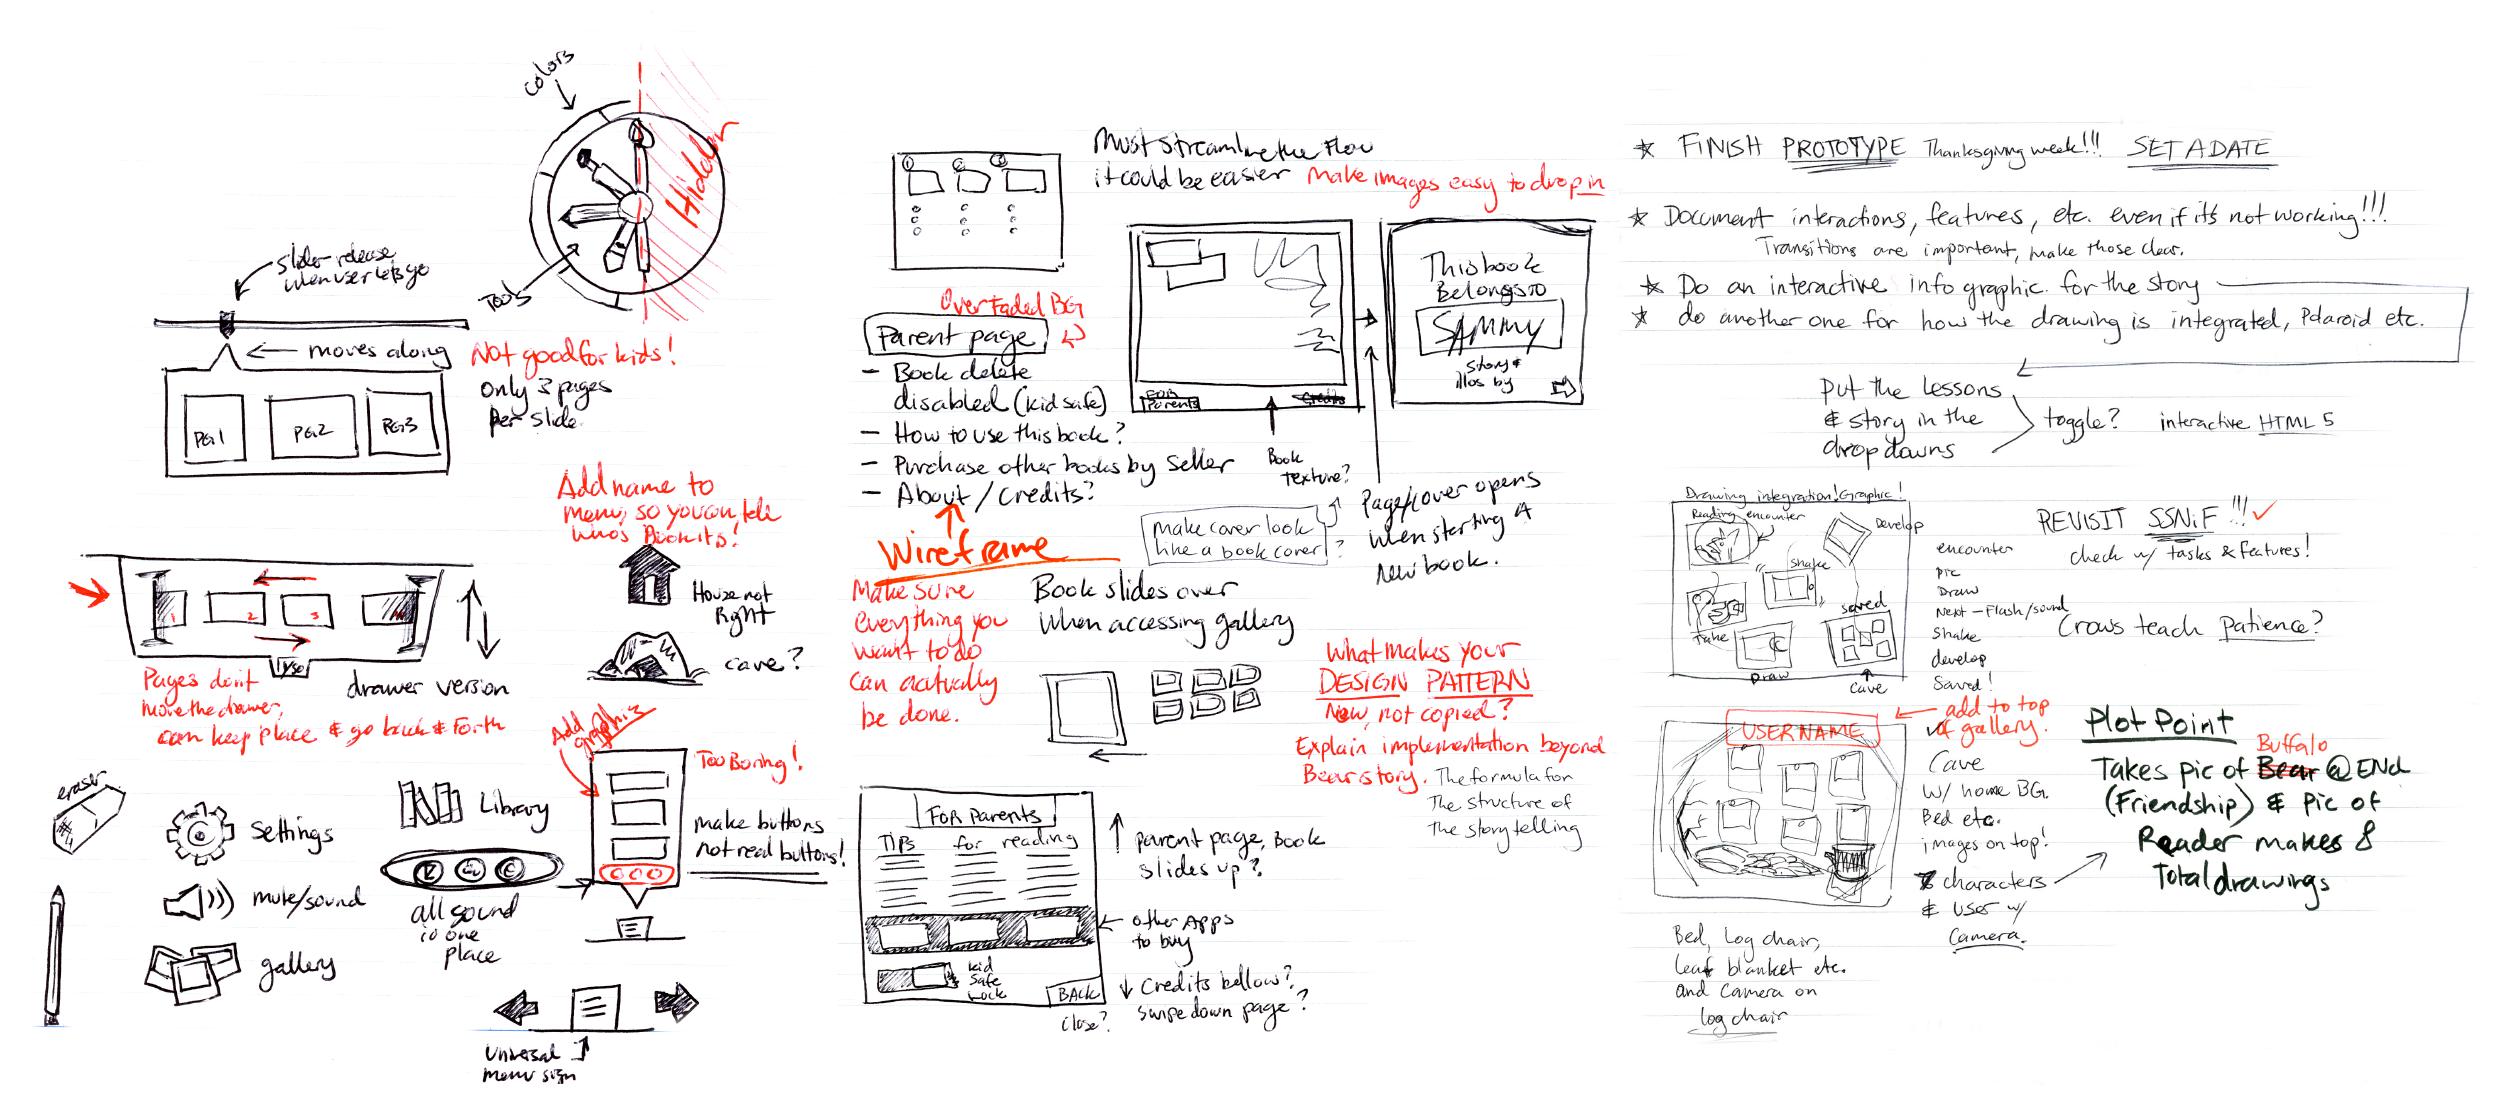 bpc-sketches@2x.png